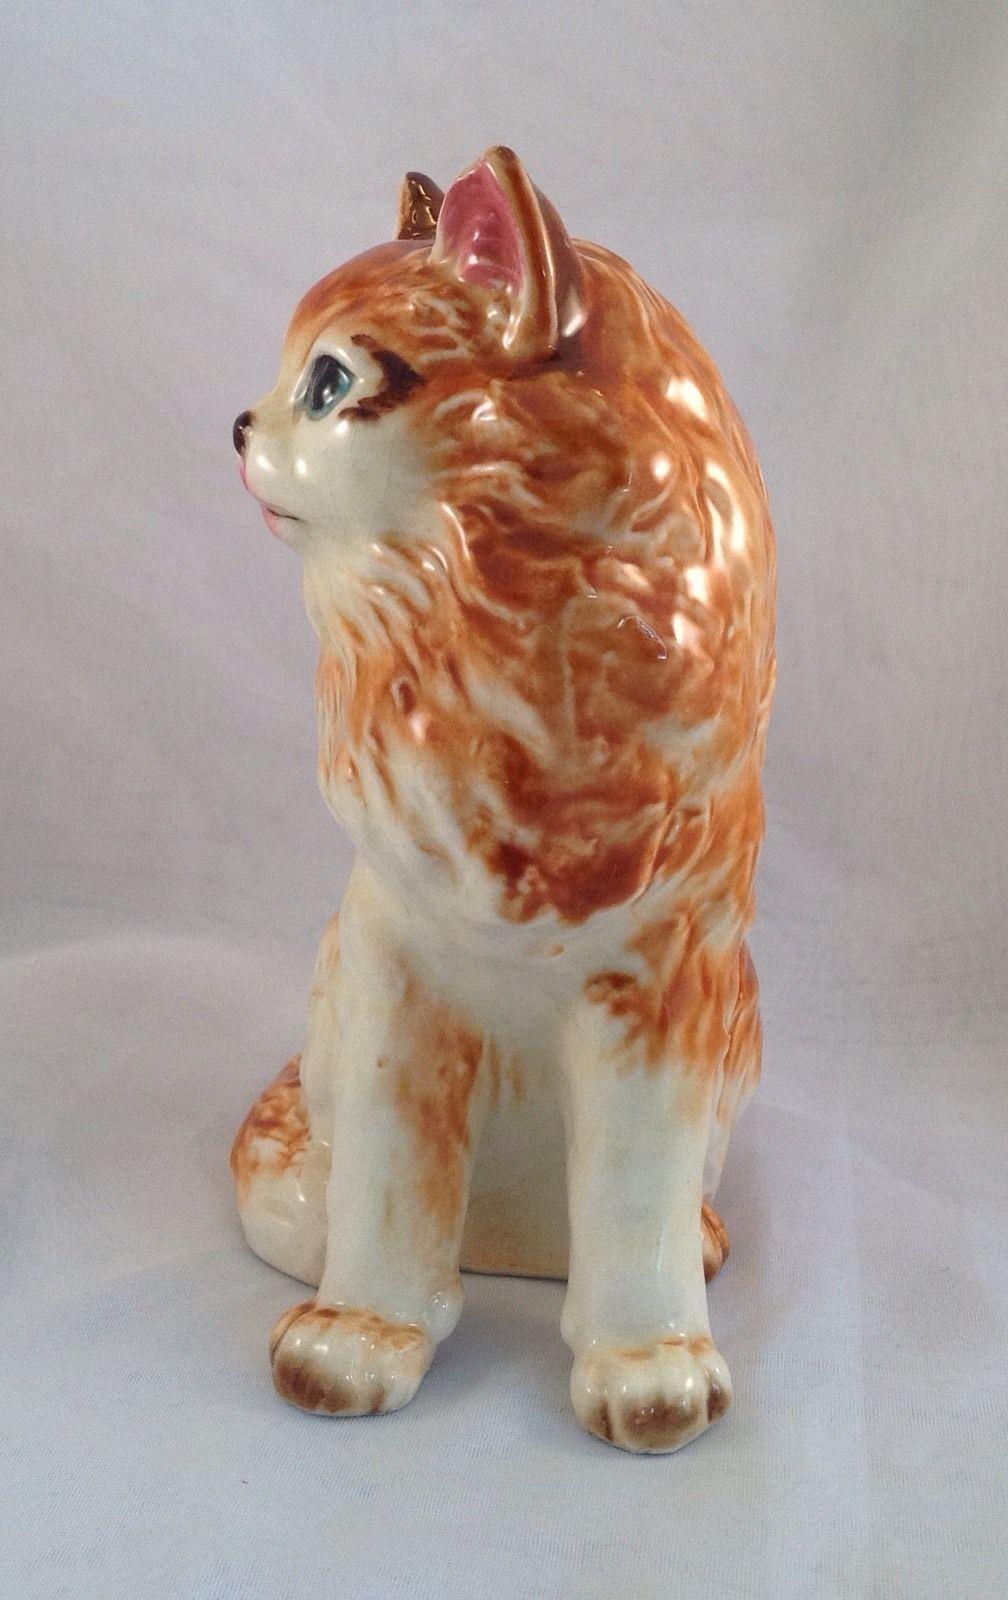 "Large Vtg Mid Century 1950s Nippon Yoko Boeki Japan Orange Tabby Cat Figurine 7"" | eBay"